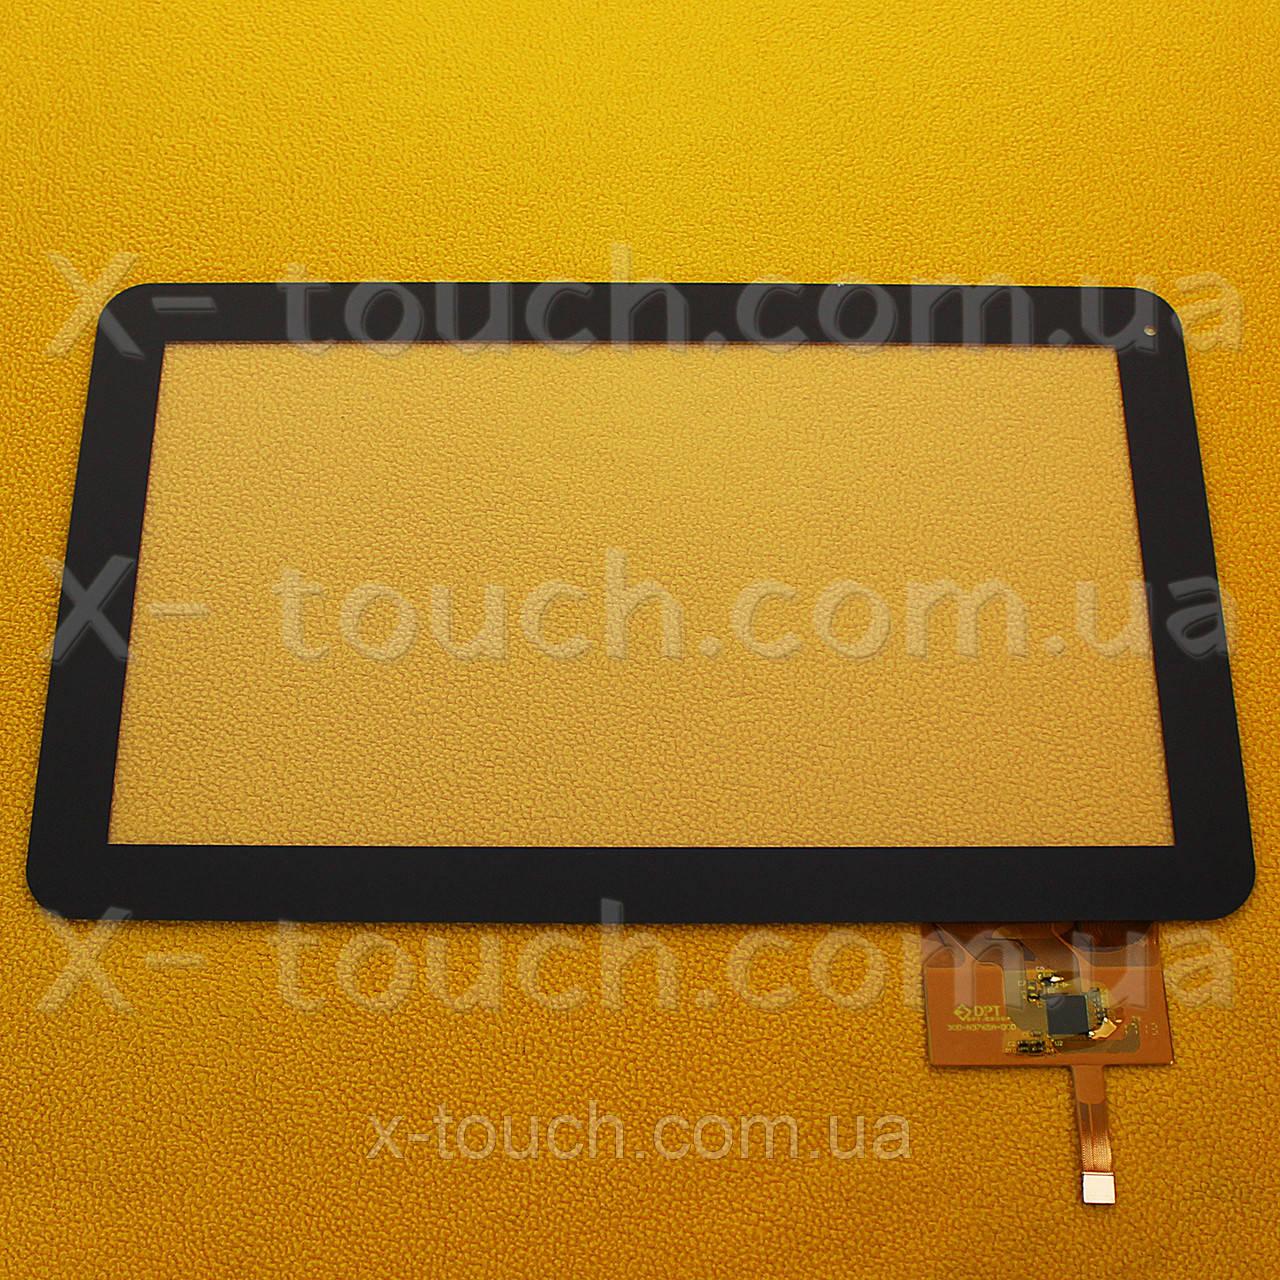 Тачскрин, сенсор  DPT 300-N3765A-C00  для планшета